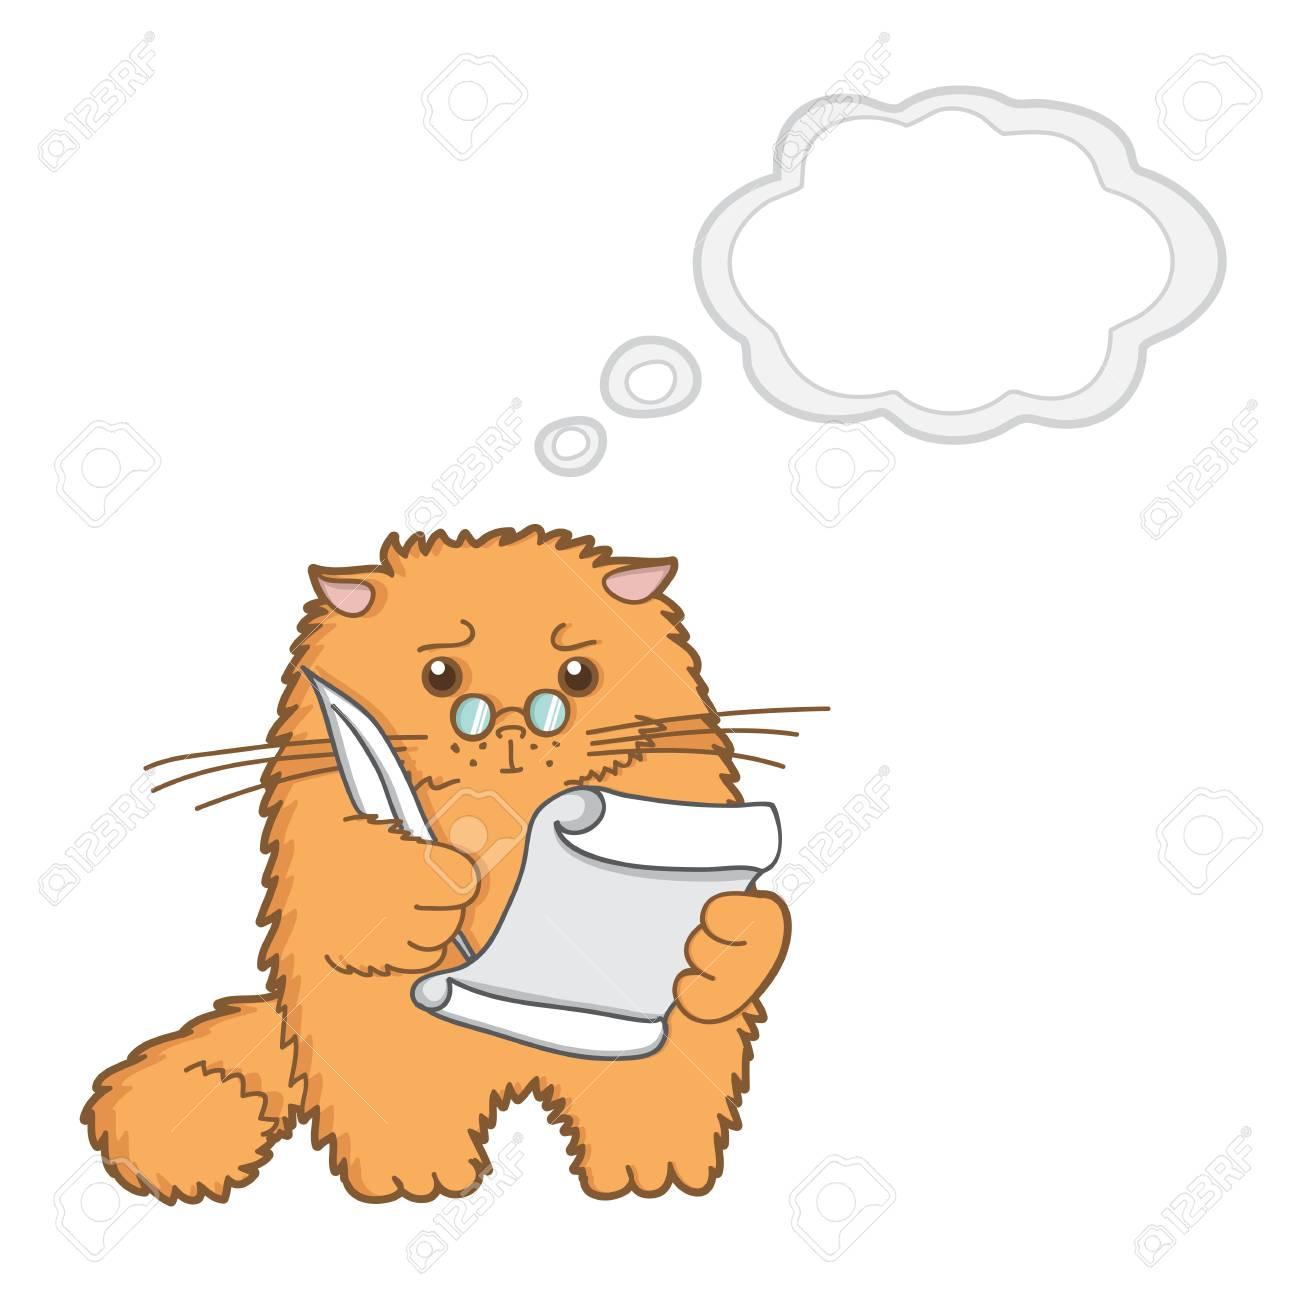 funny cartoon cat Stock Vector - 20840368